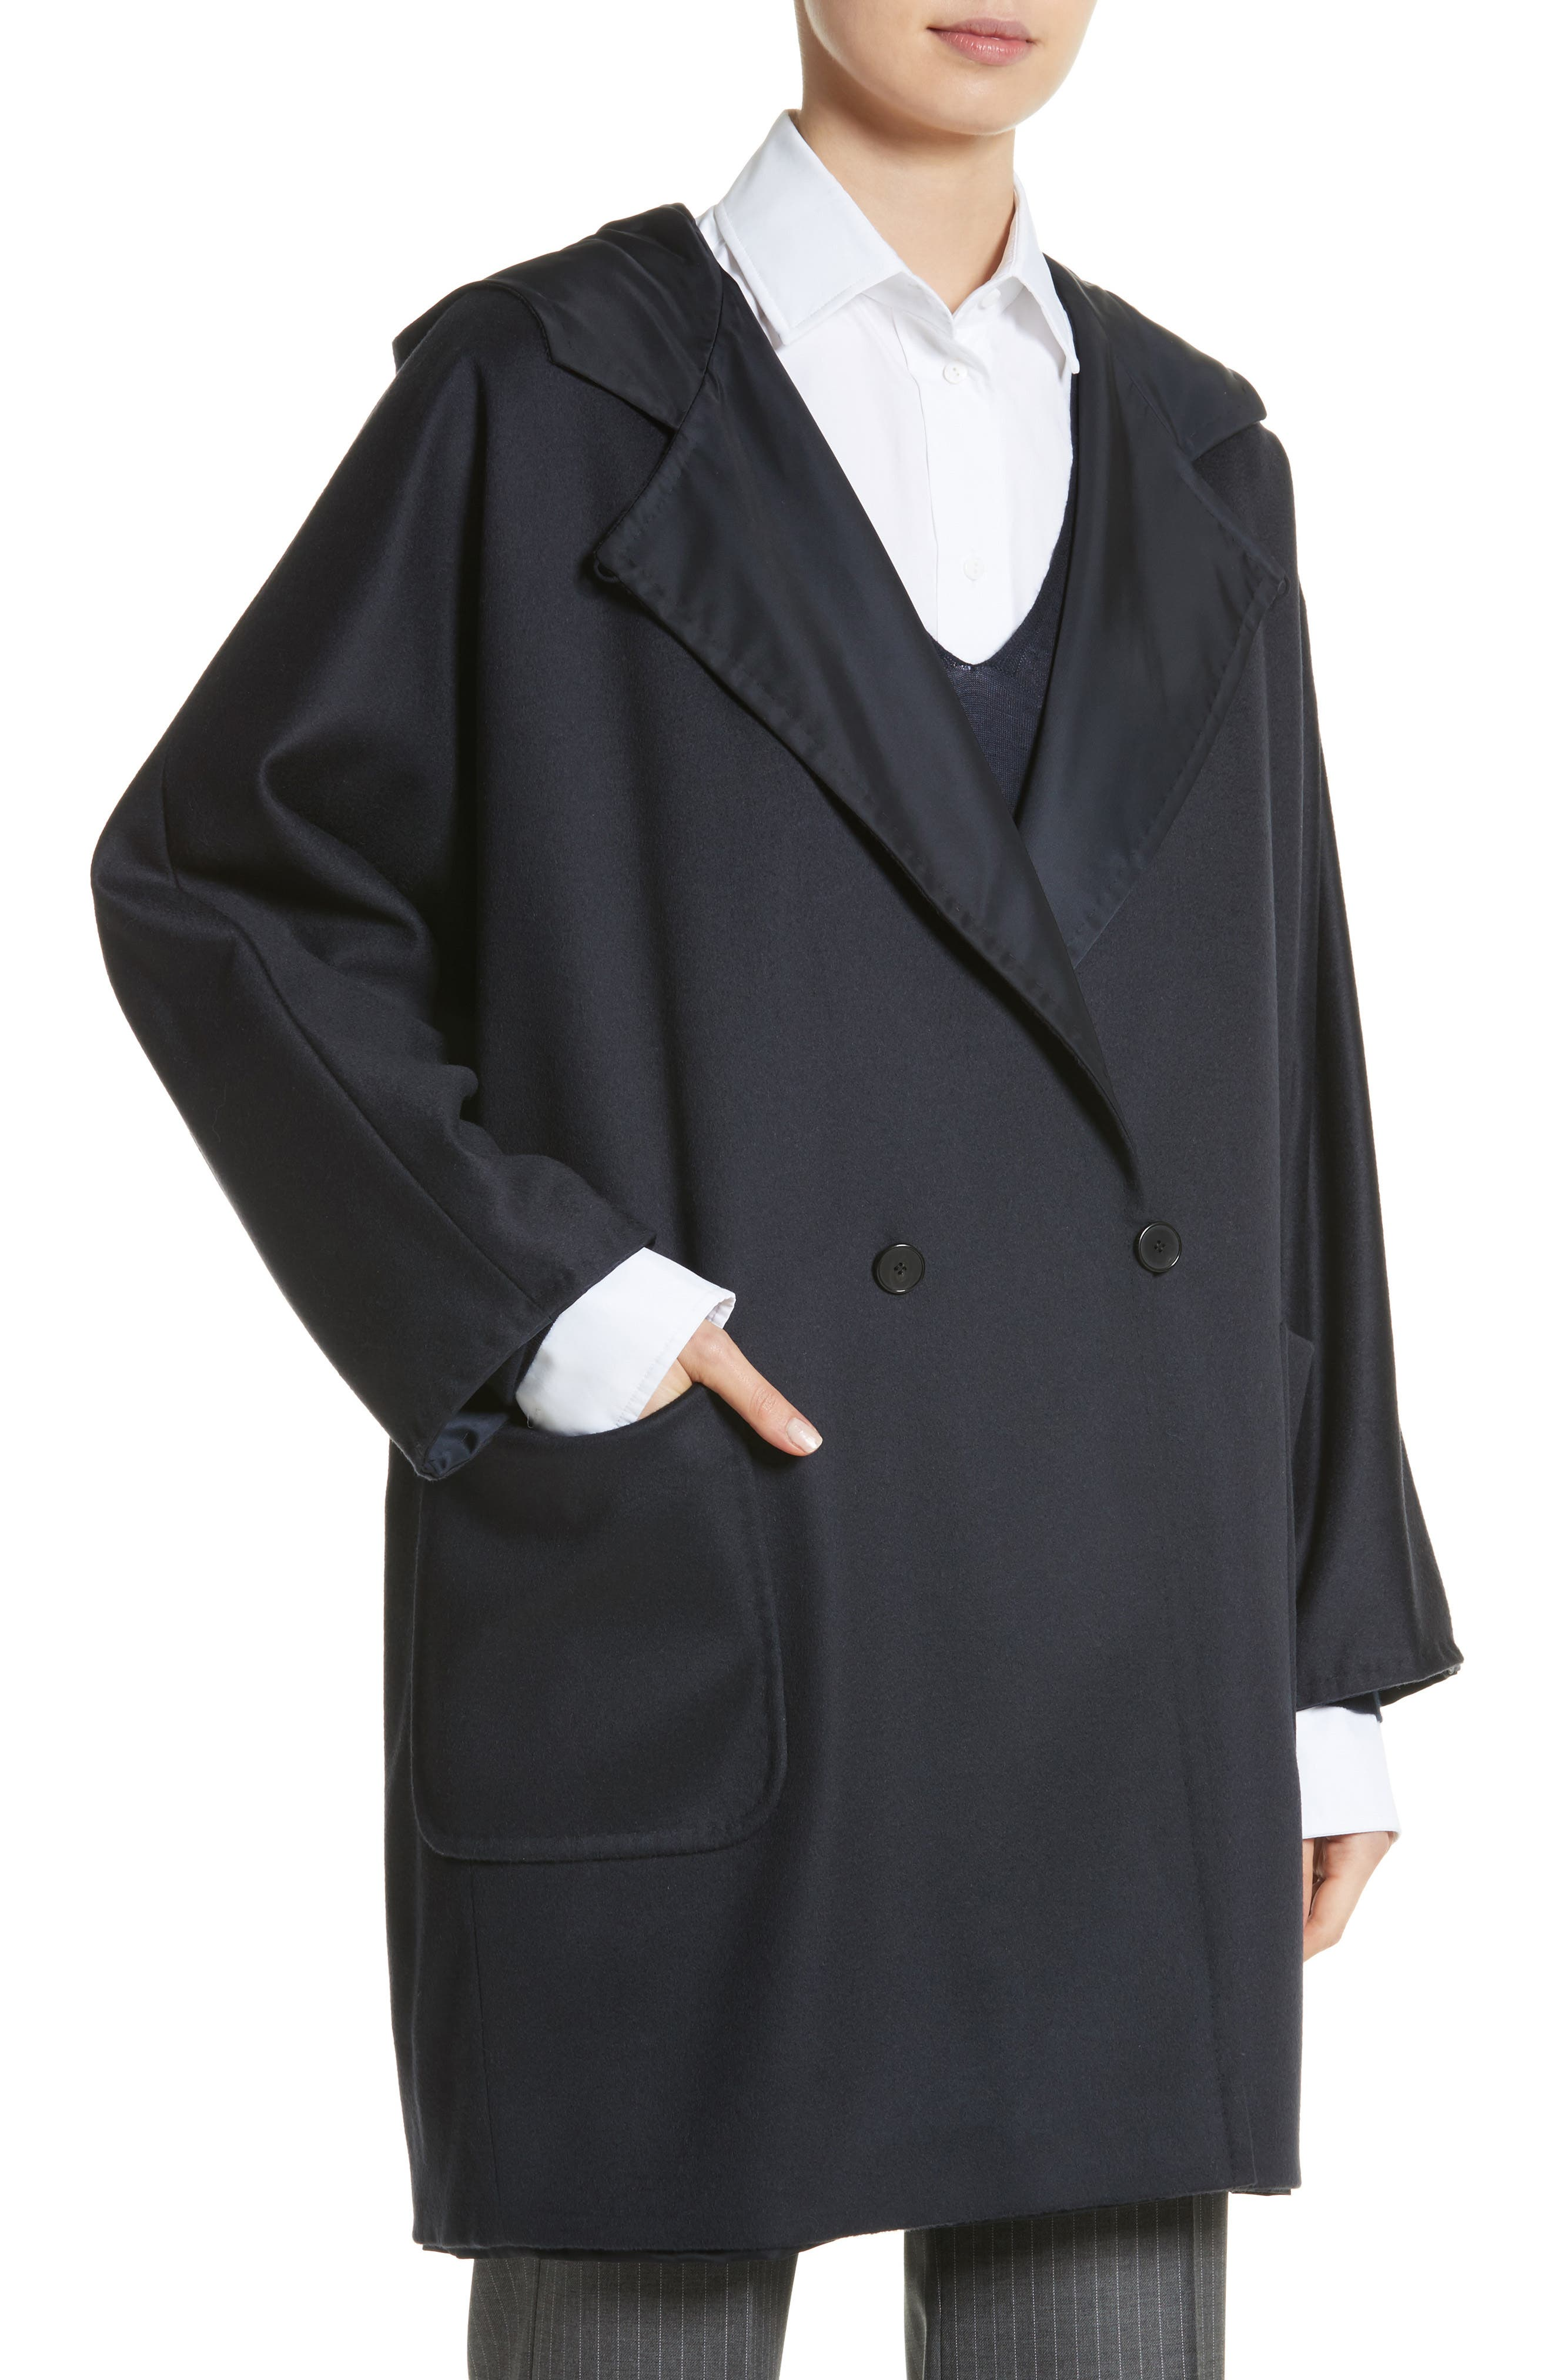 Jacopo Reversible Hooded Coat,                             Alternate thumbnail 2, color,